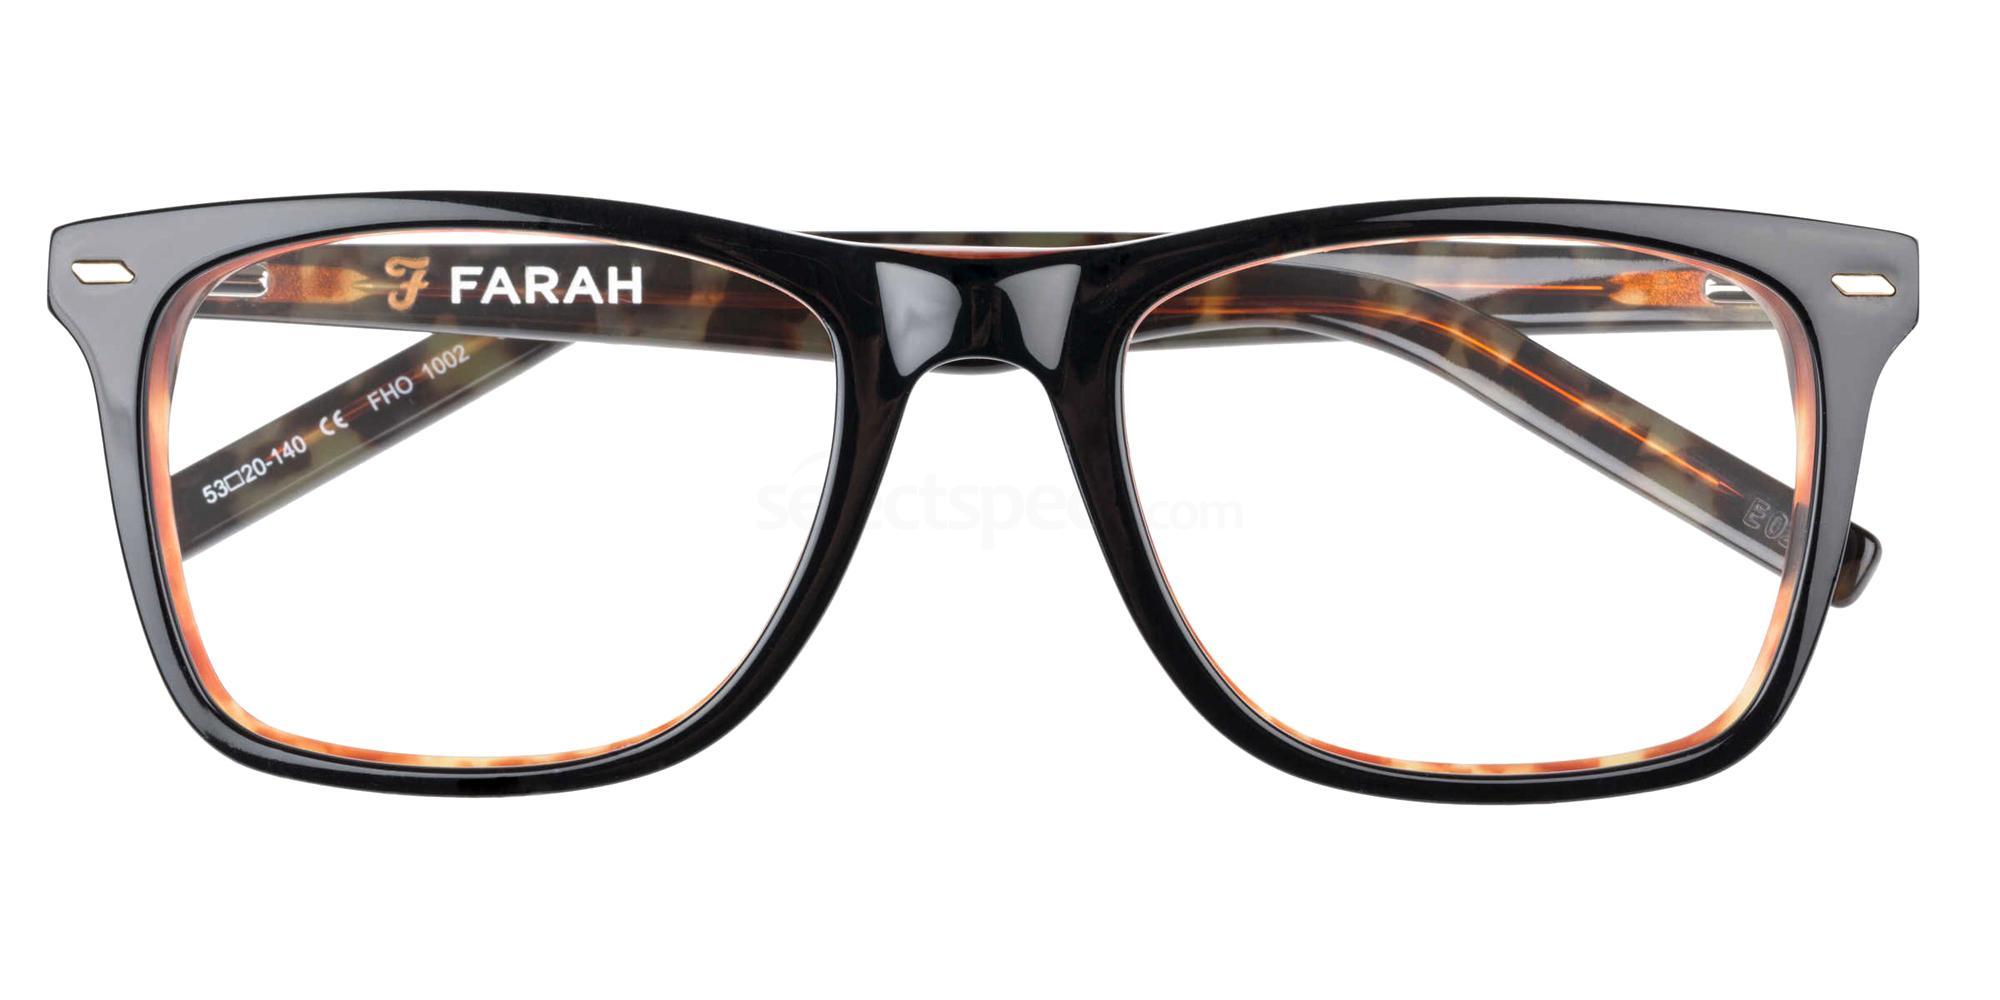 102 FHO-1002 Glasses, Farah